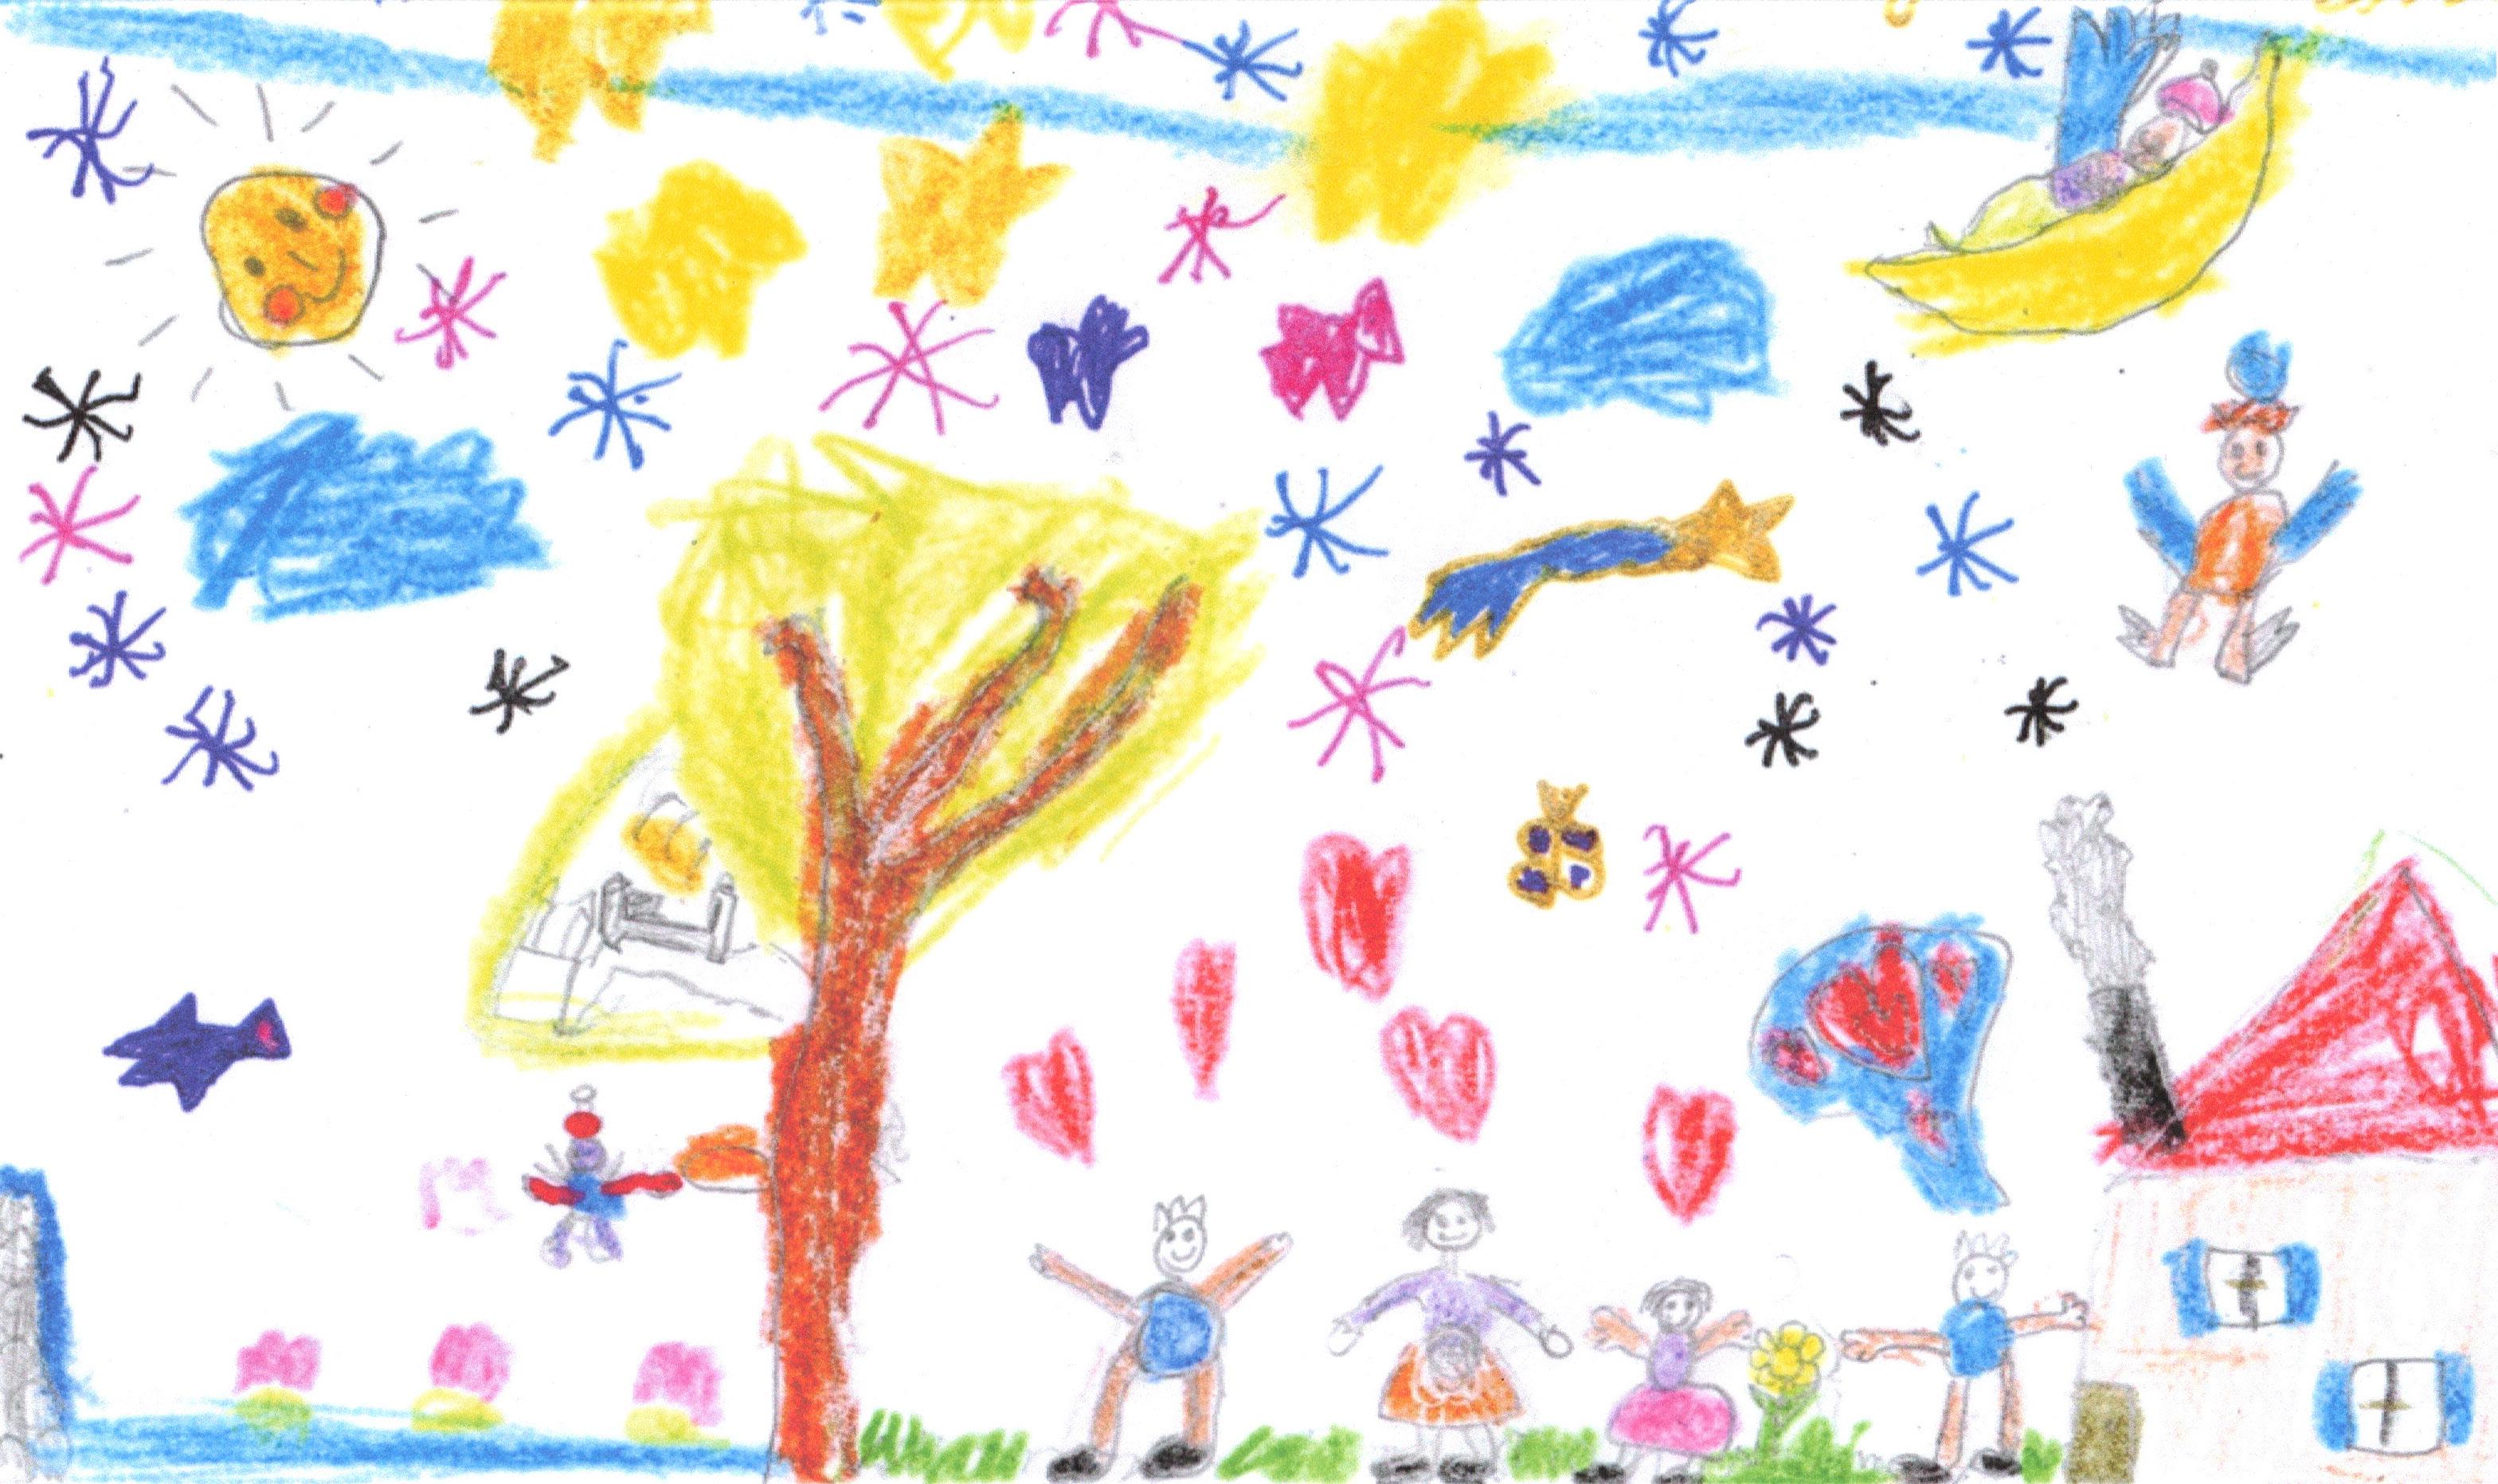 dessins-enfant-1461791780.jpg